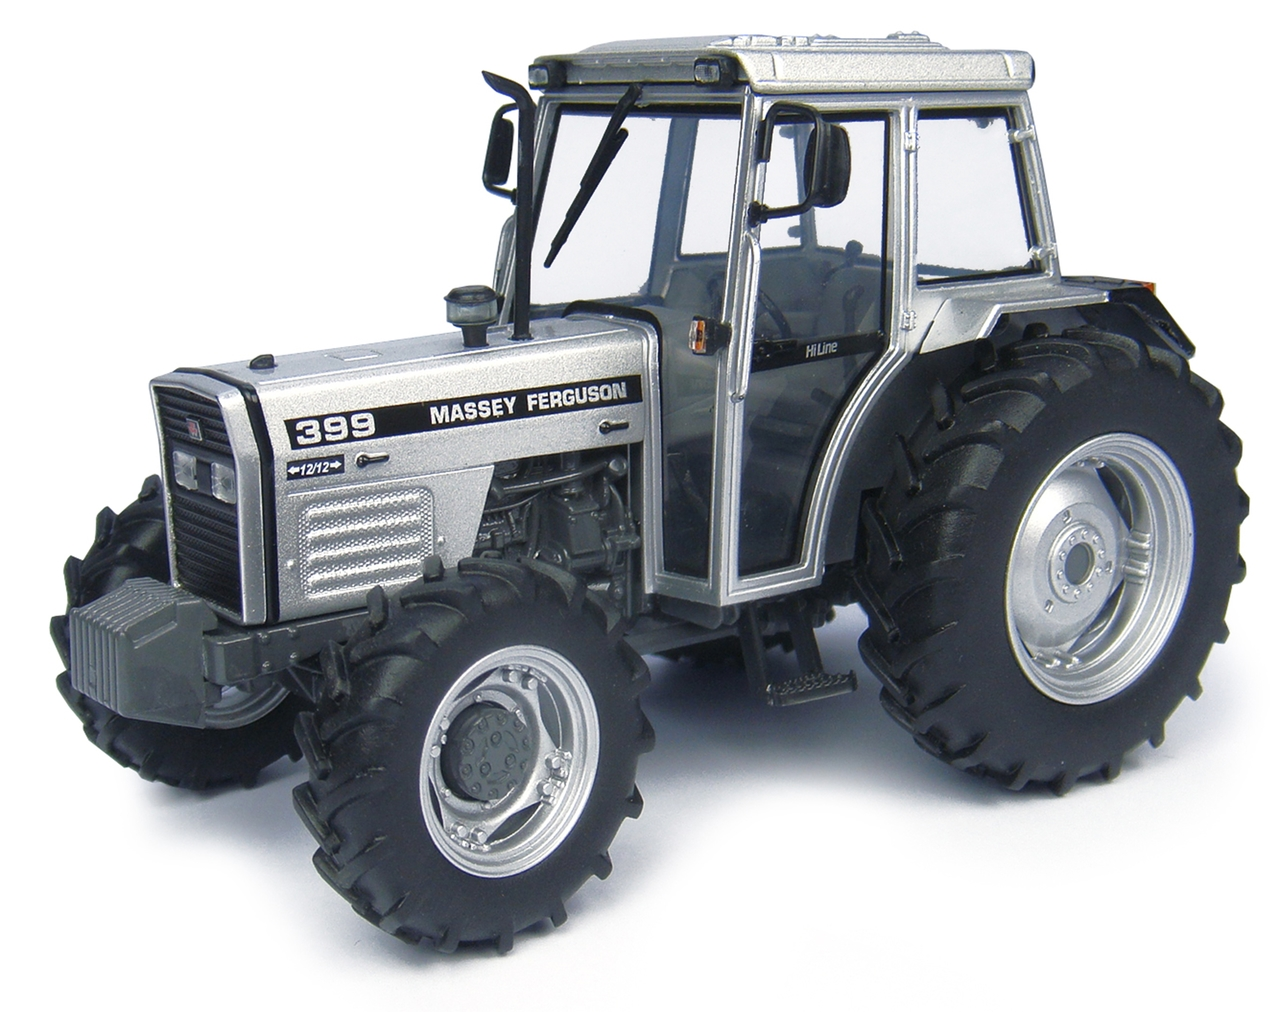 Massey Ferguson 399 Tractor Silver Edition